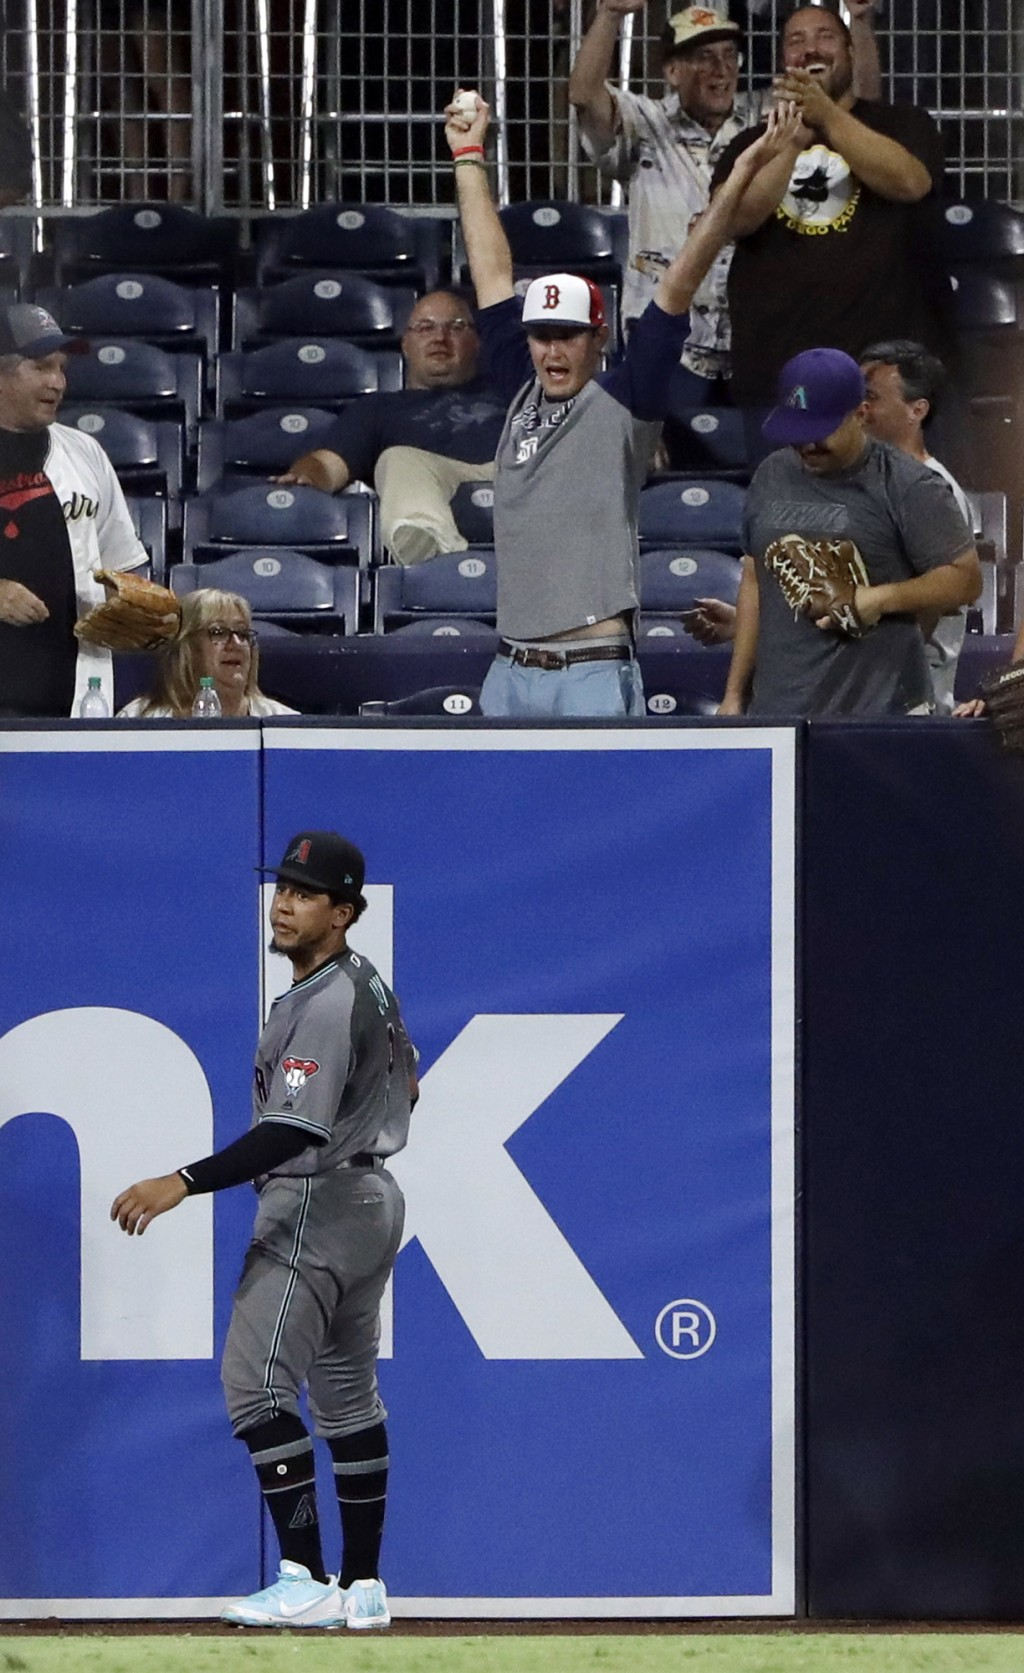 A fan reacts after catching a home run ball hit by the San Diego Padres' Manuel Margot as Arizona Diamondbacks center fielder Jon Jay, below, looks on...